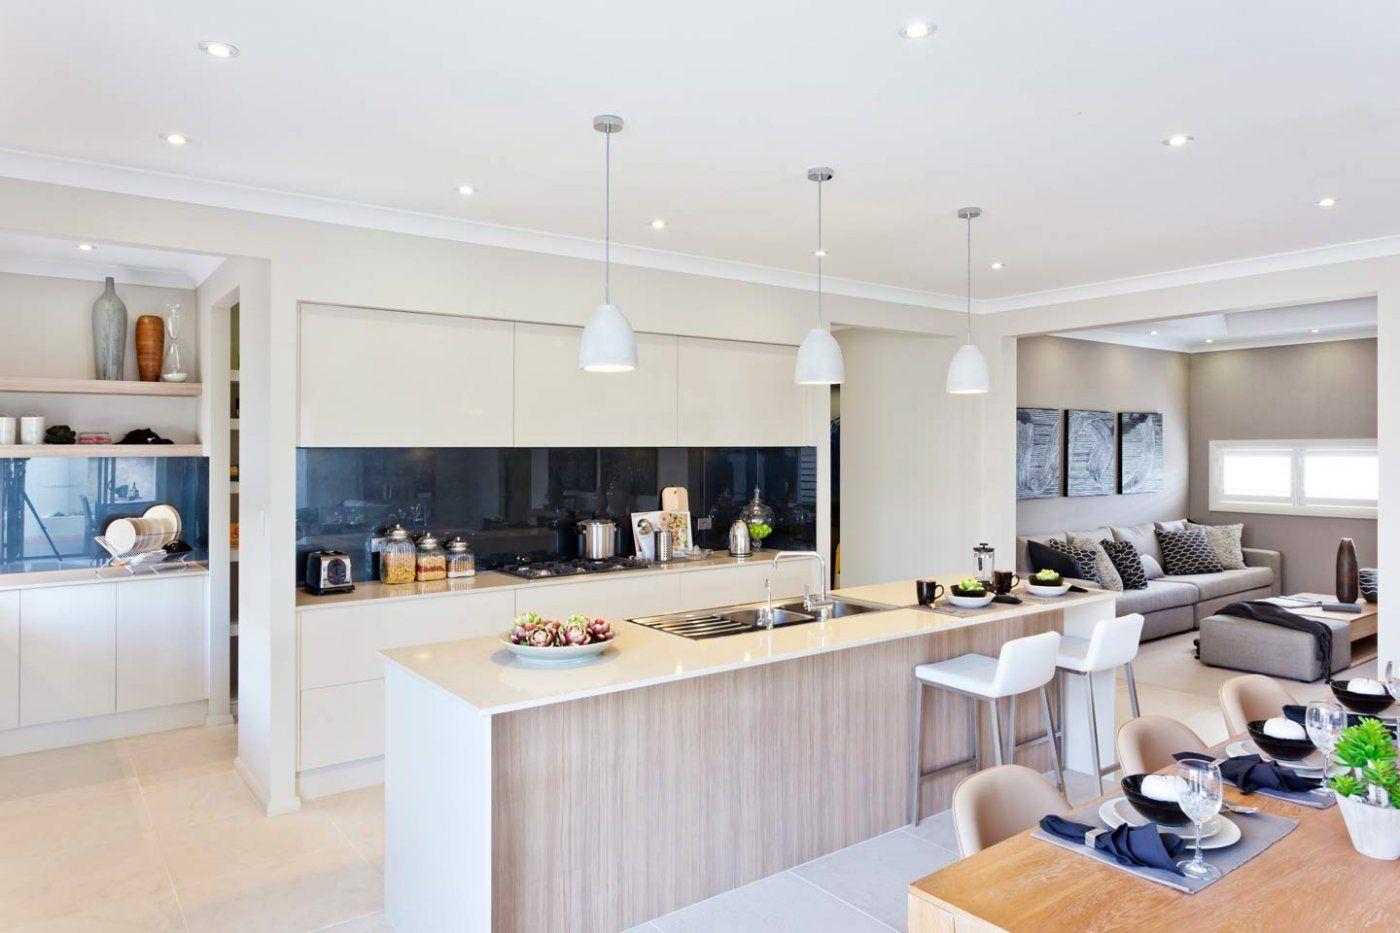 Large Gourmet Kitchen House Plans. 183 best home design images on ...